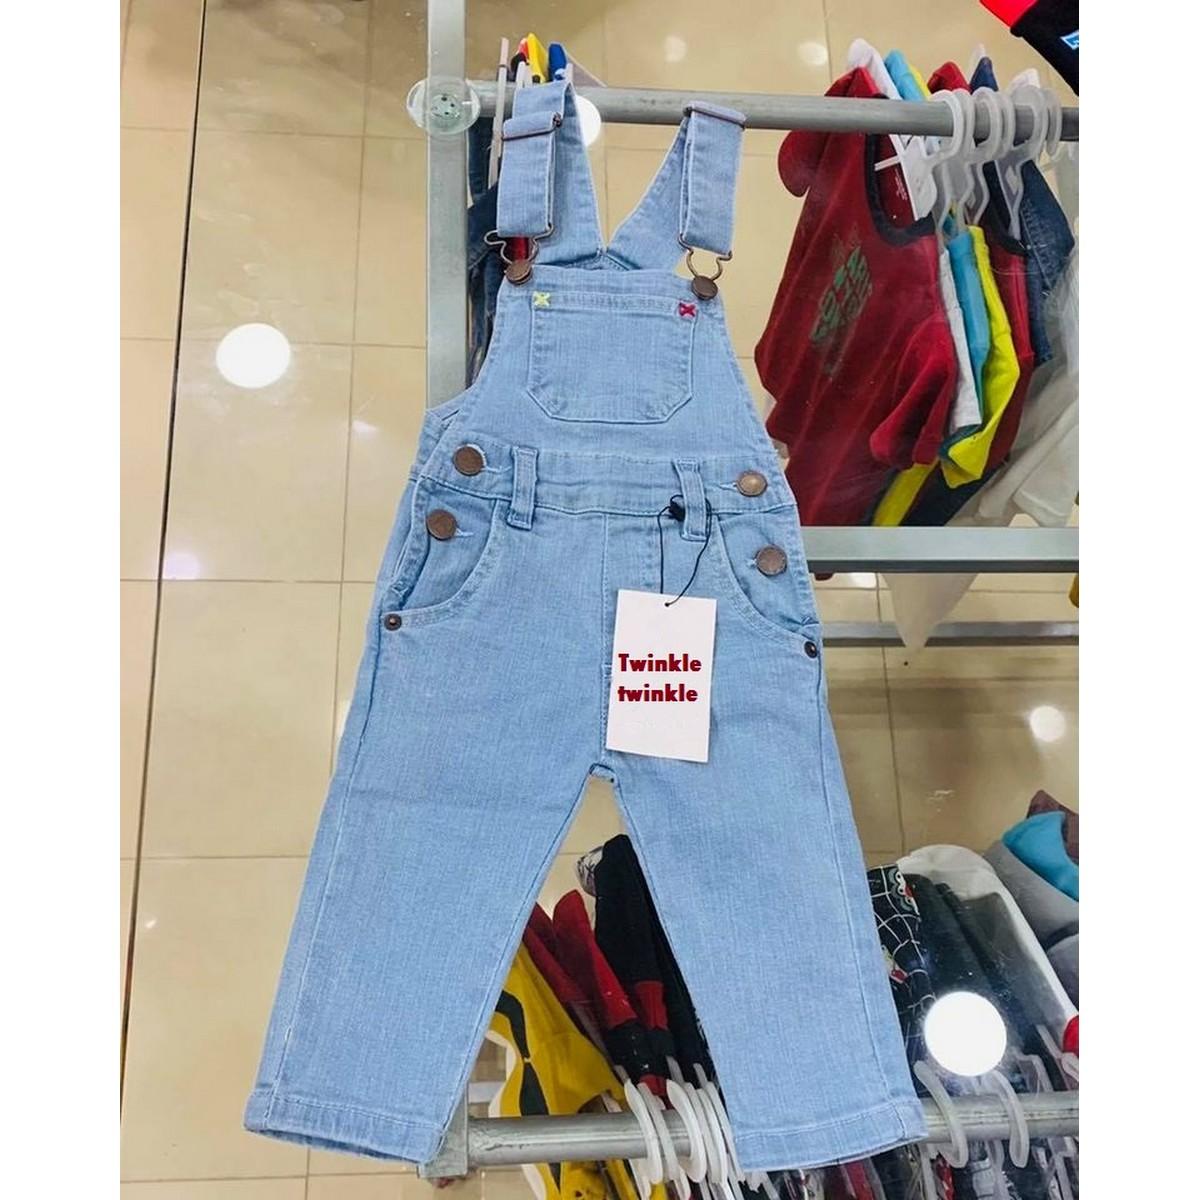 Gorgeous denim jeans romper in 5 shades